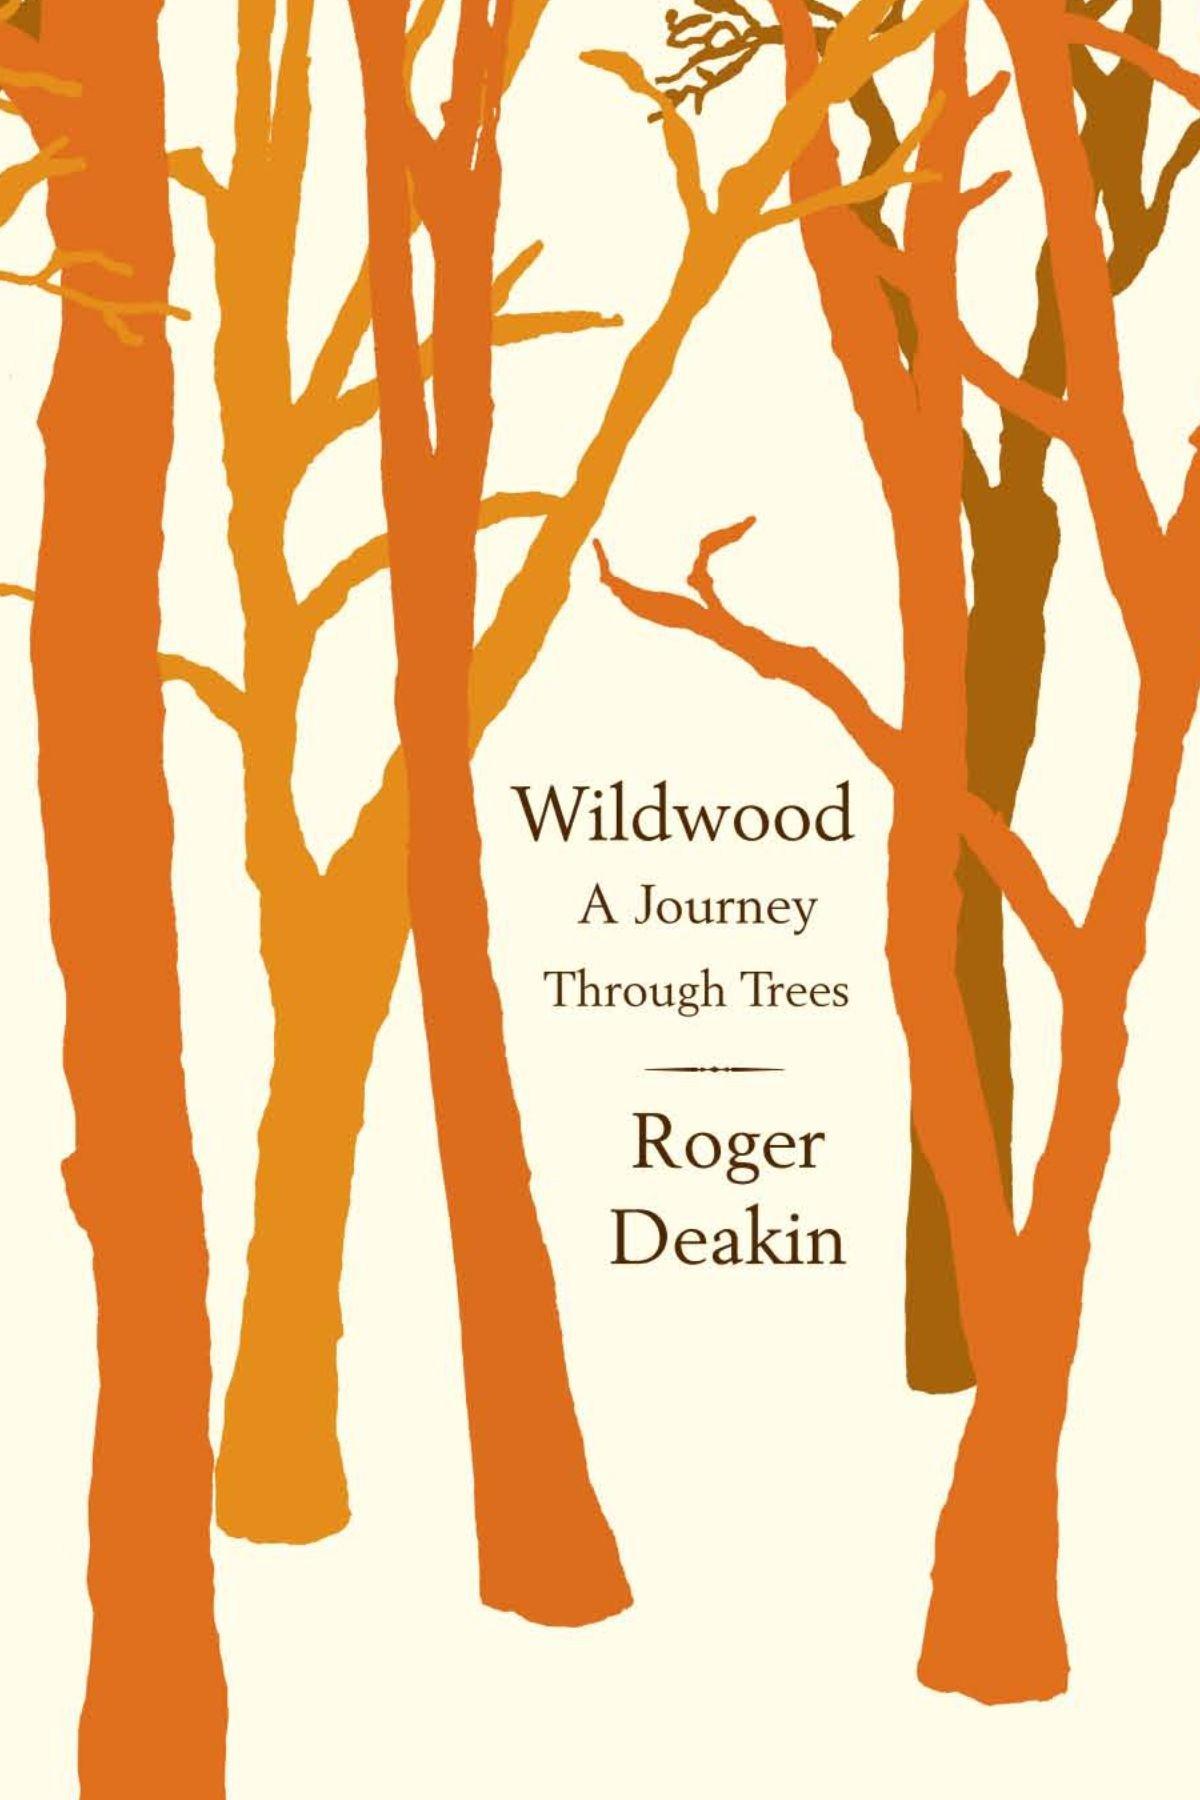 Literature Review          DEAKIN UNIVERSITY ENGLISH LANGUAGE     DILIGENTLYSTARTING GA